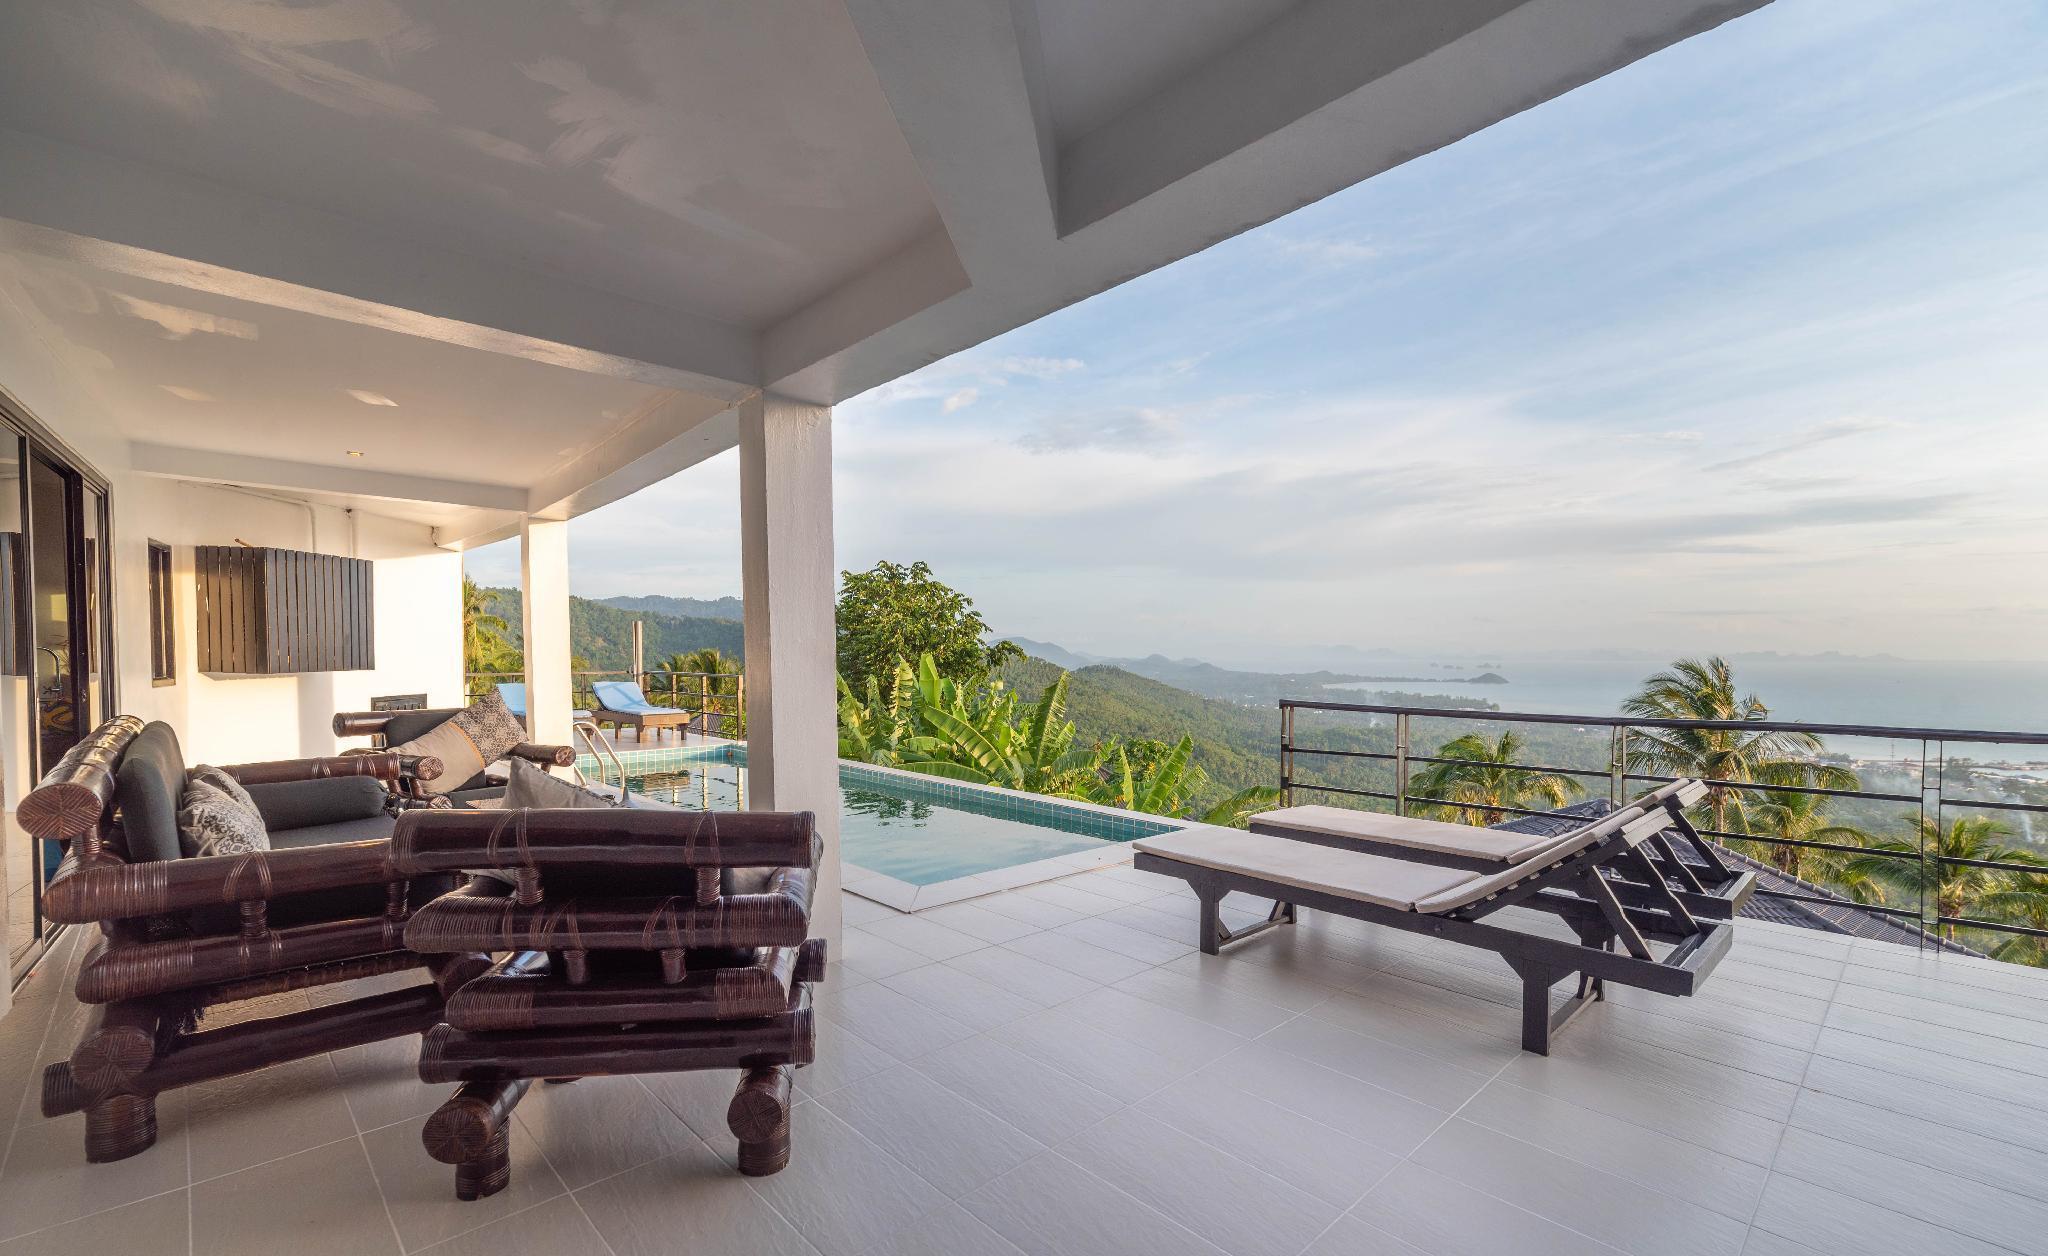 Panorama Villa 3BR-Private Pool & Sea Sunset View วิลลา 3 ห้องนอน 3 ห้องน้ำส่วนตัว ขนาด 200 ตร.ม. – หน้าทอน